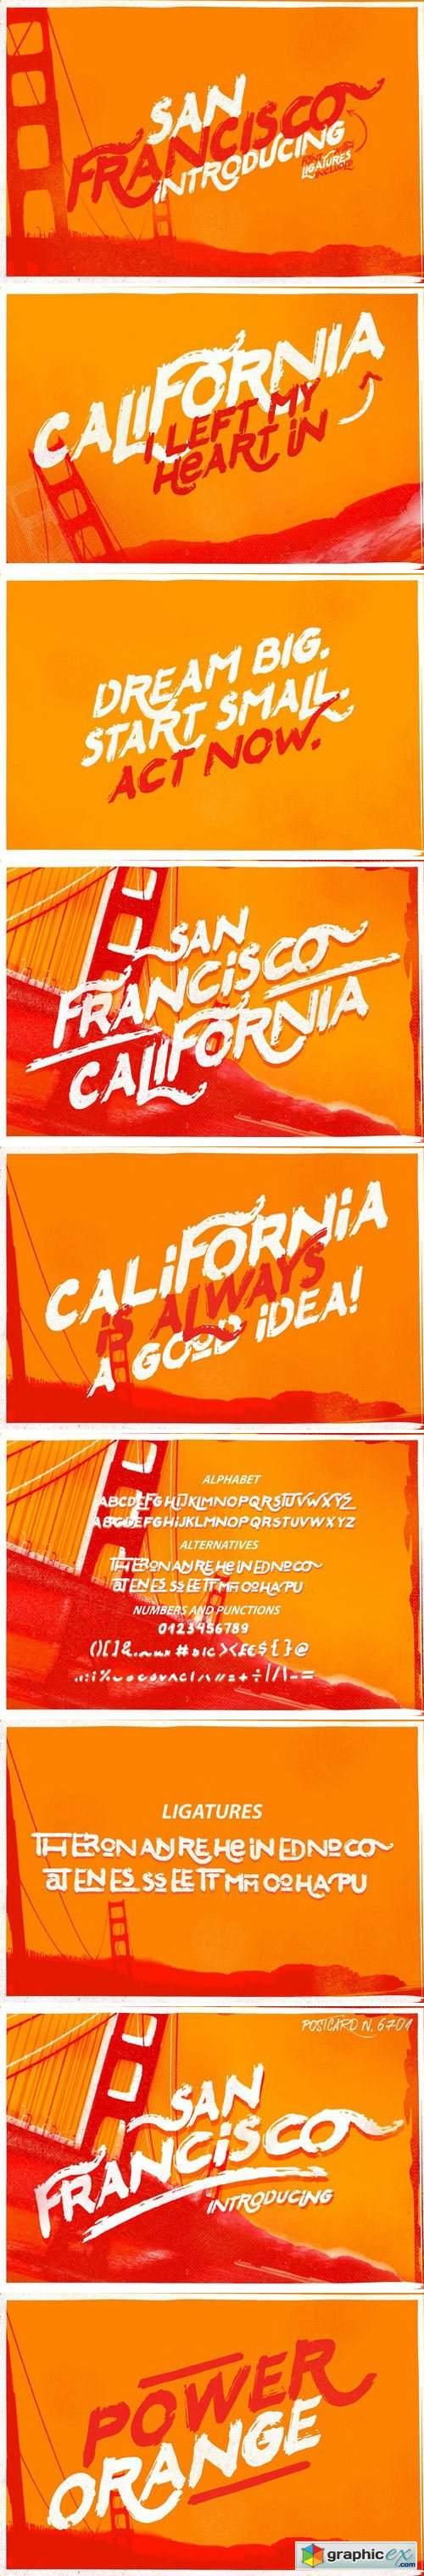 San Francisco Font » Free Download Vector Stock Image